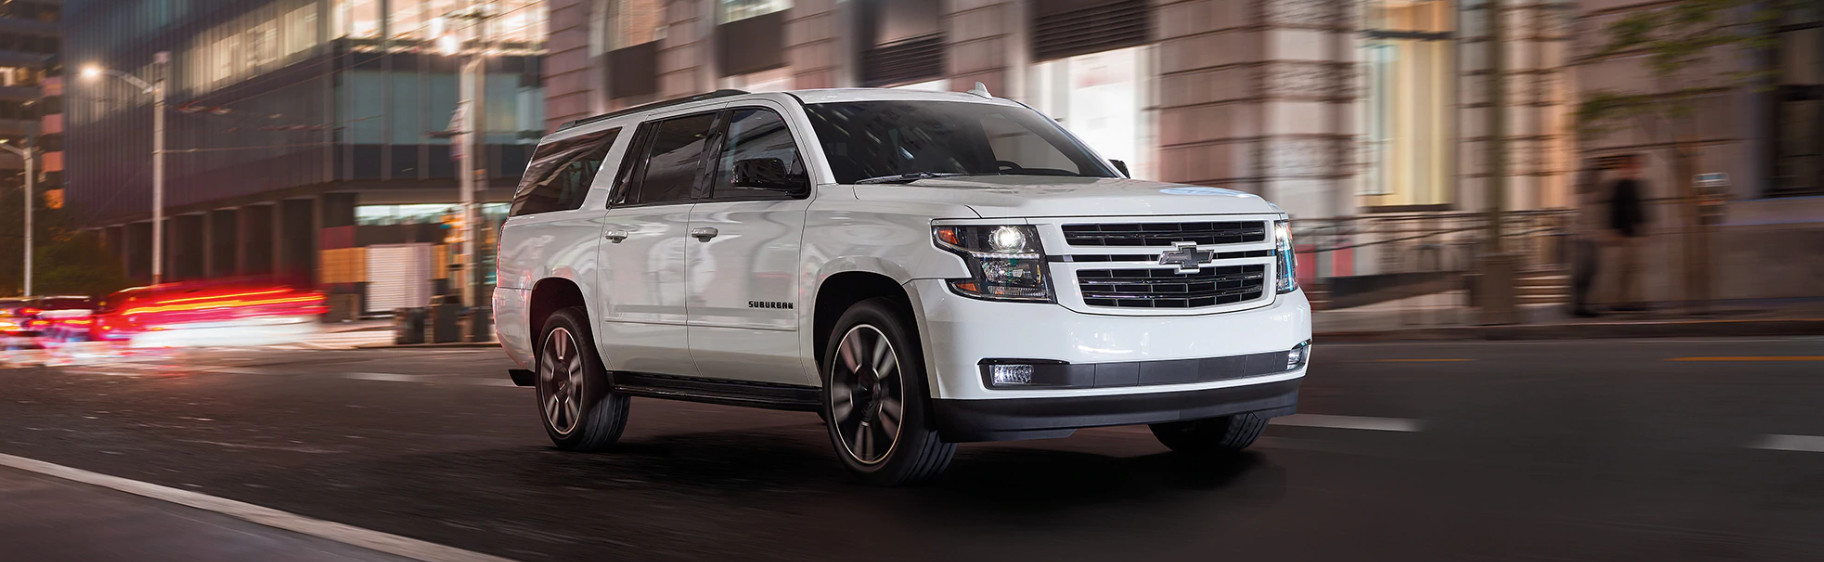 2020 Chevrolet Suburban Leasing near Alexandria, VA